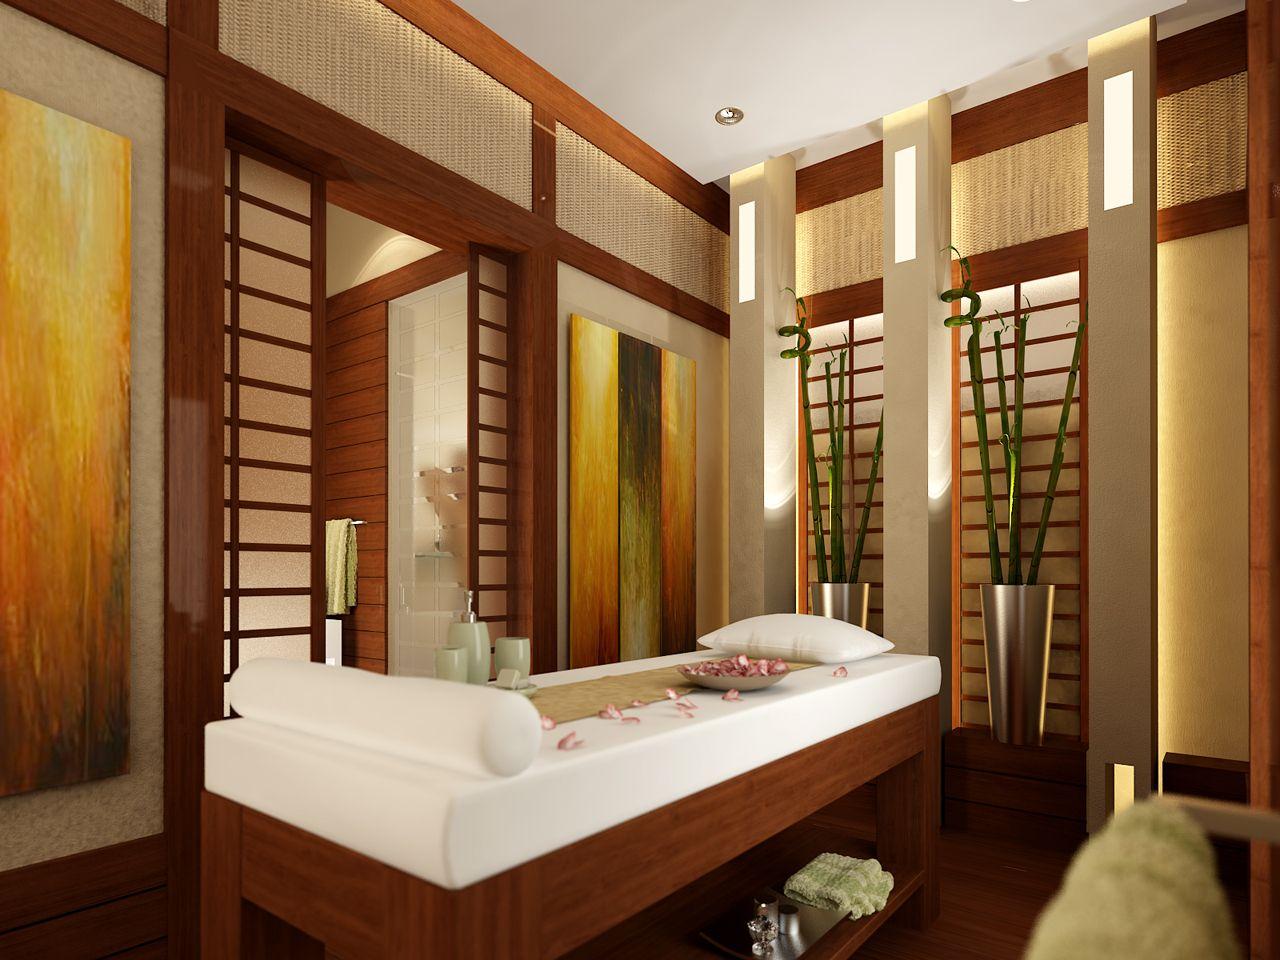 My version of a man cave or diva den massage room for Spa bedroom designs